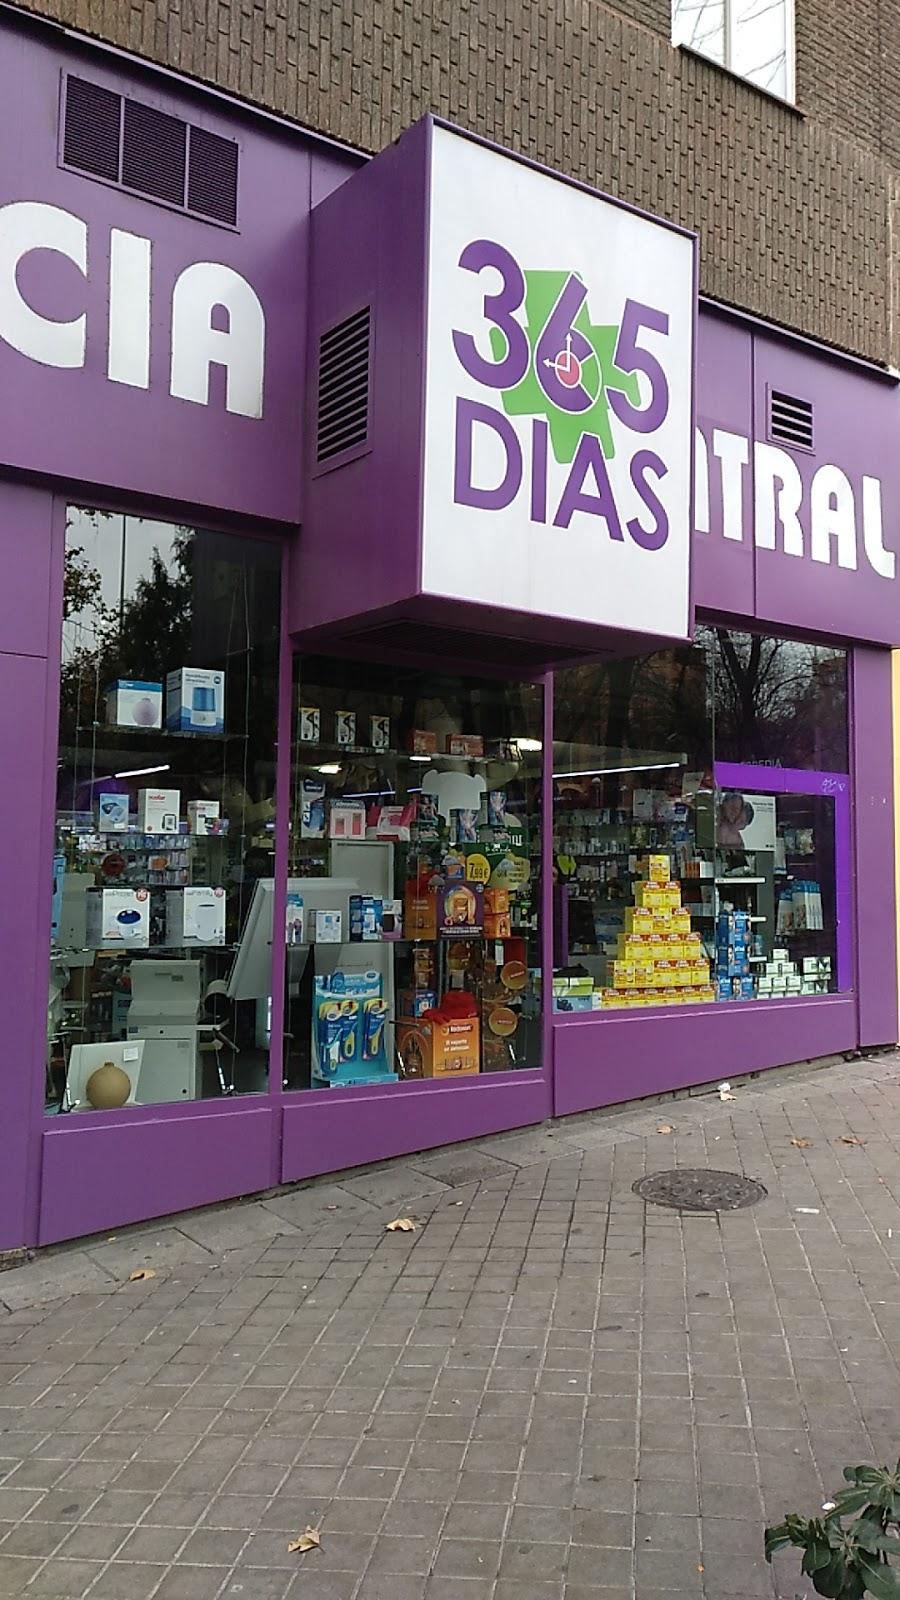 Foto farmacia Farmacia Central 365 dias